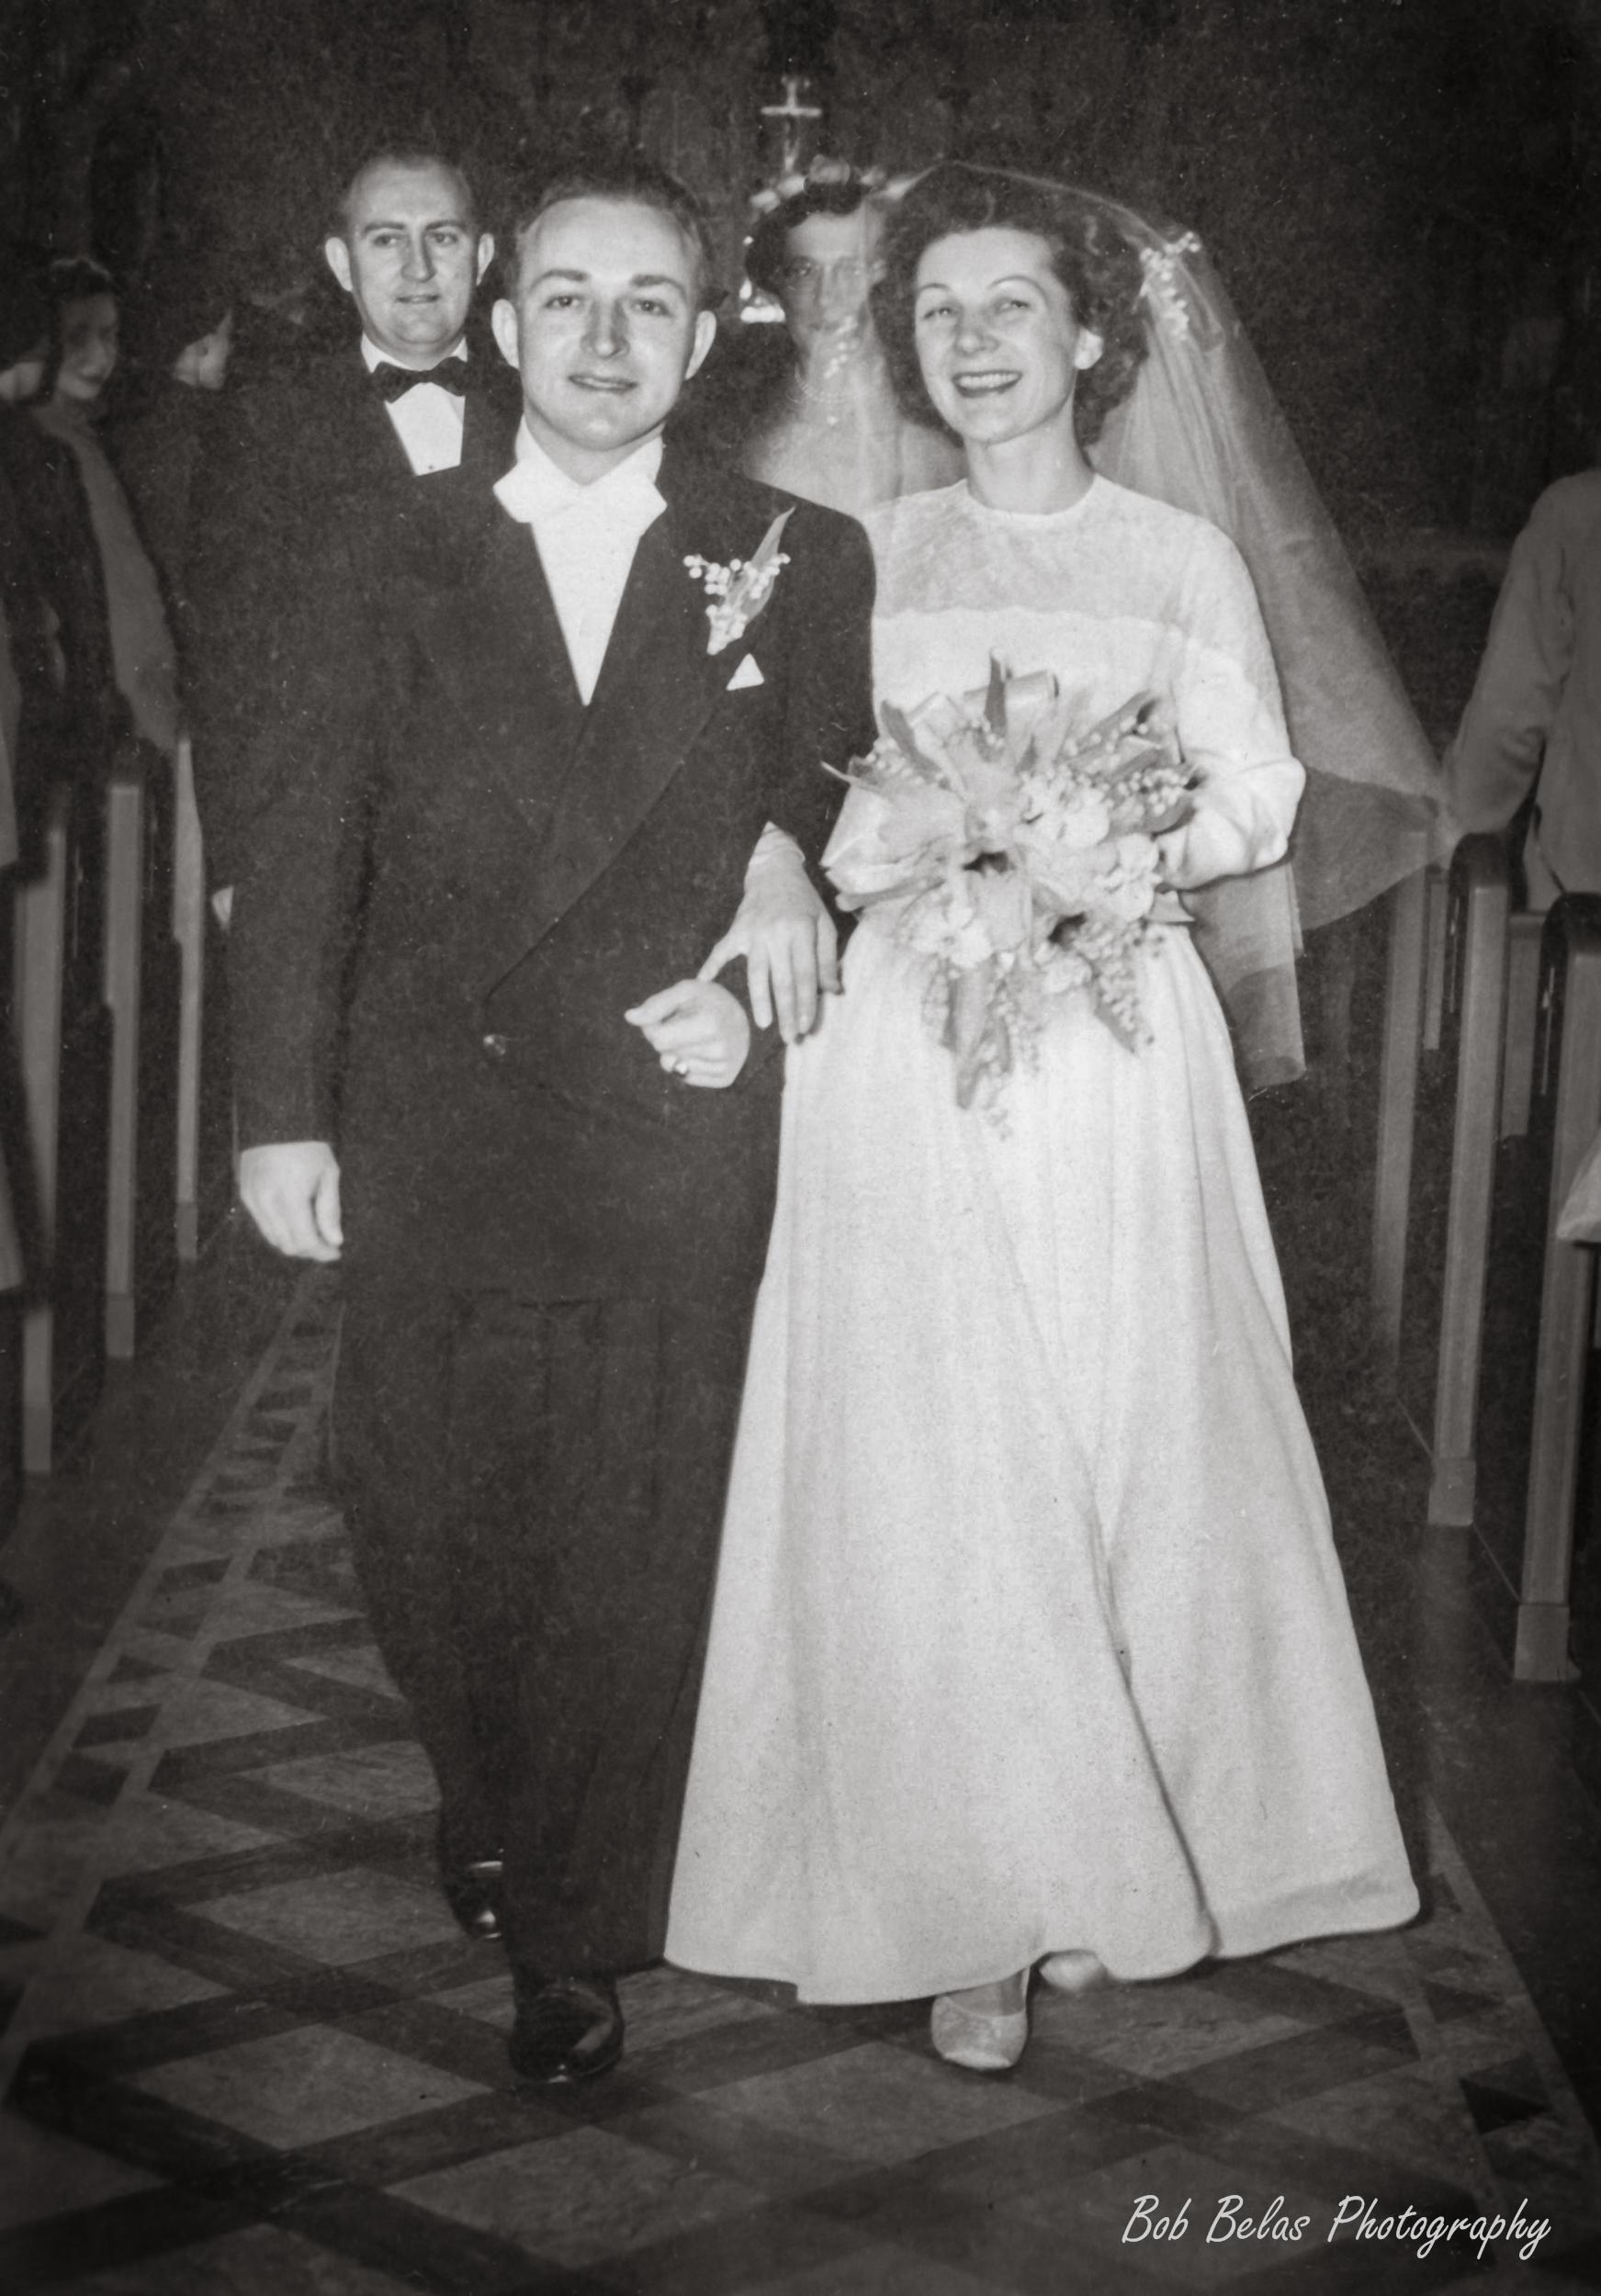 Helene and Michael Belas Wedding, monochrome